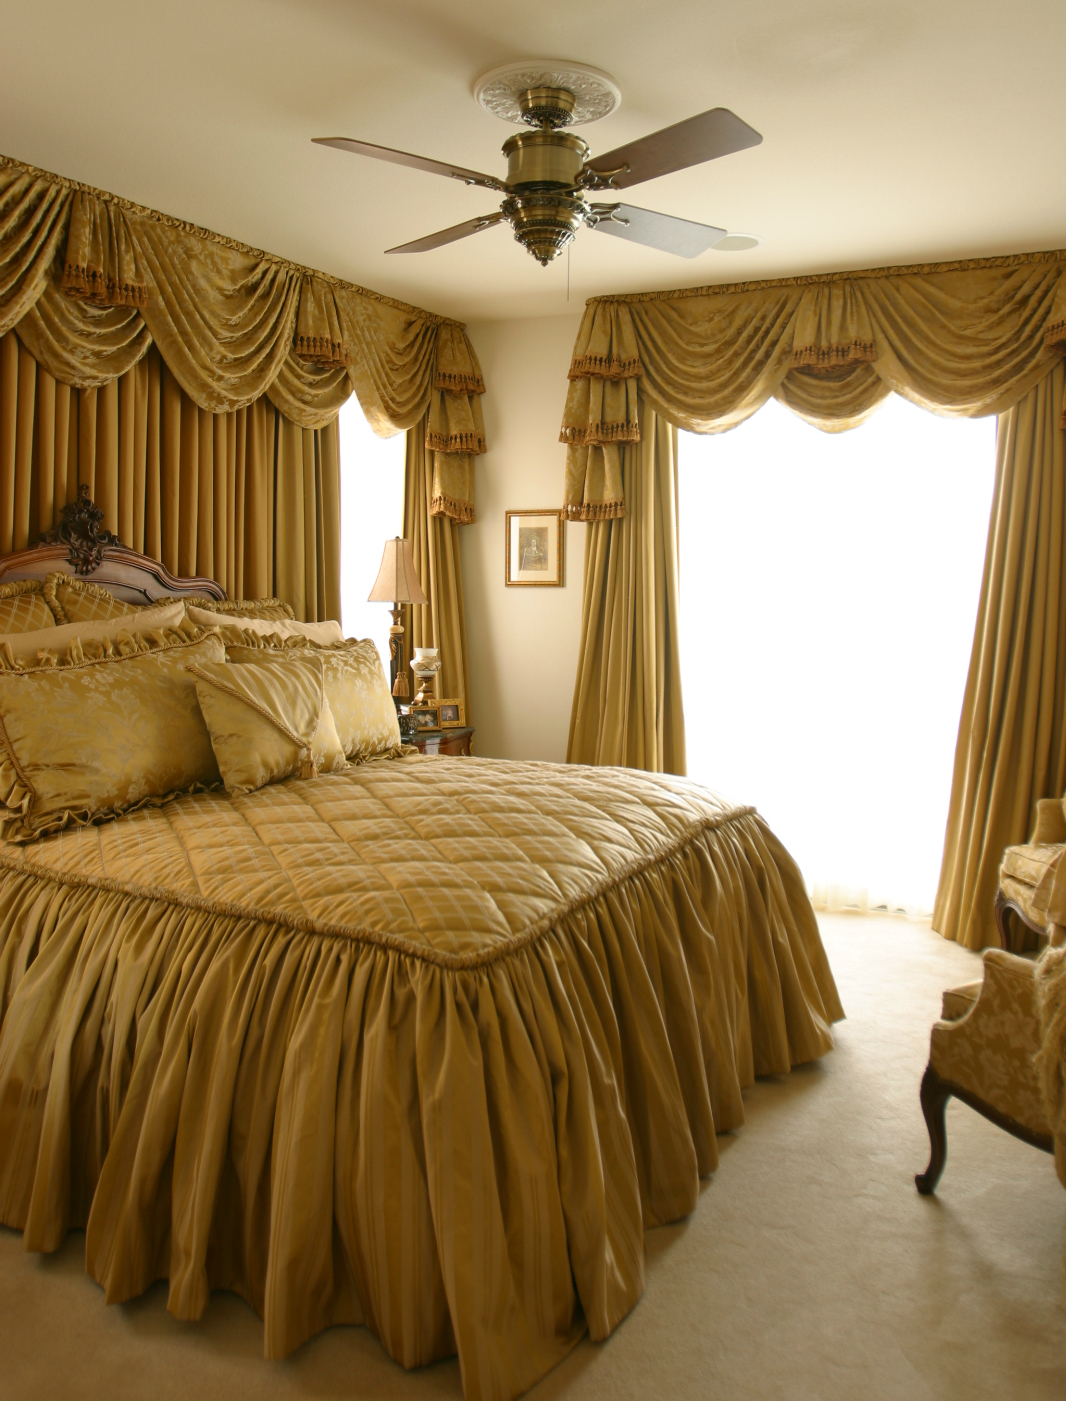 Master Bedroom with Custom Draperies